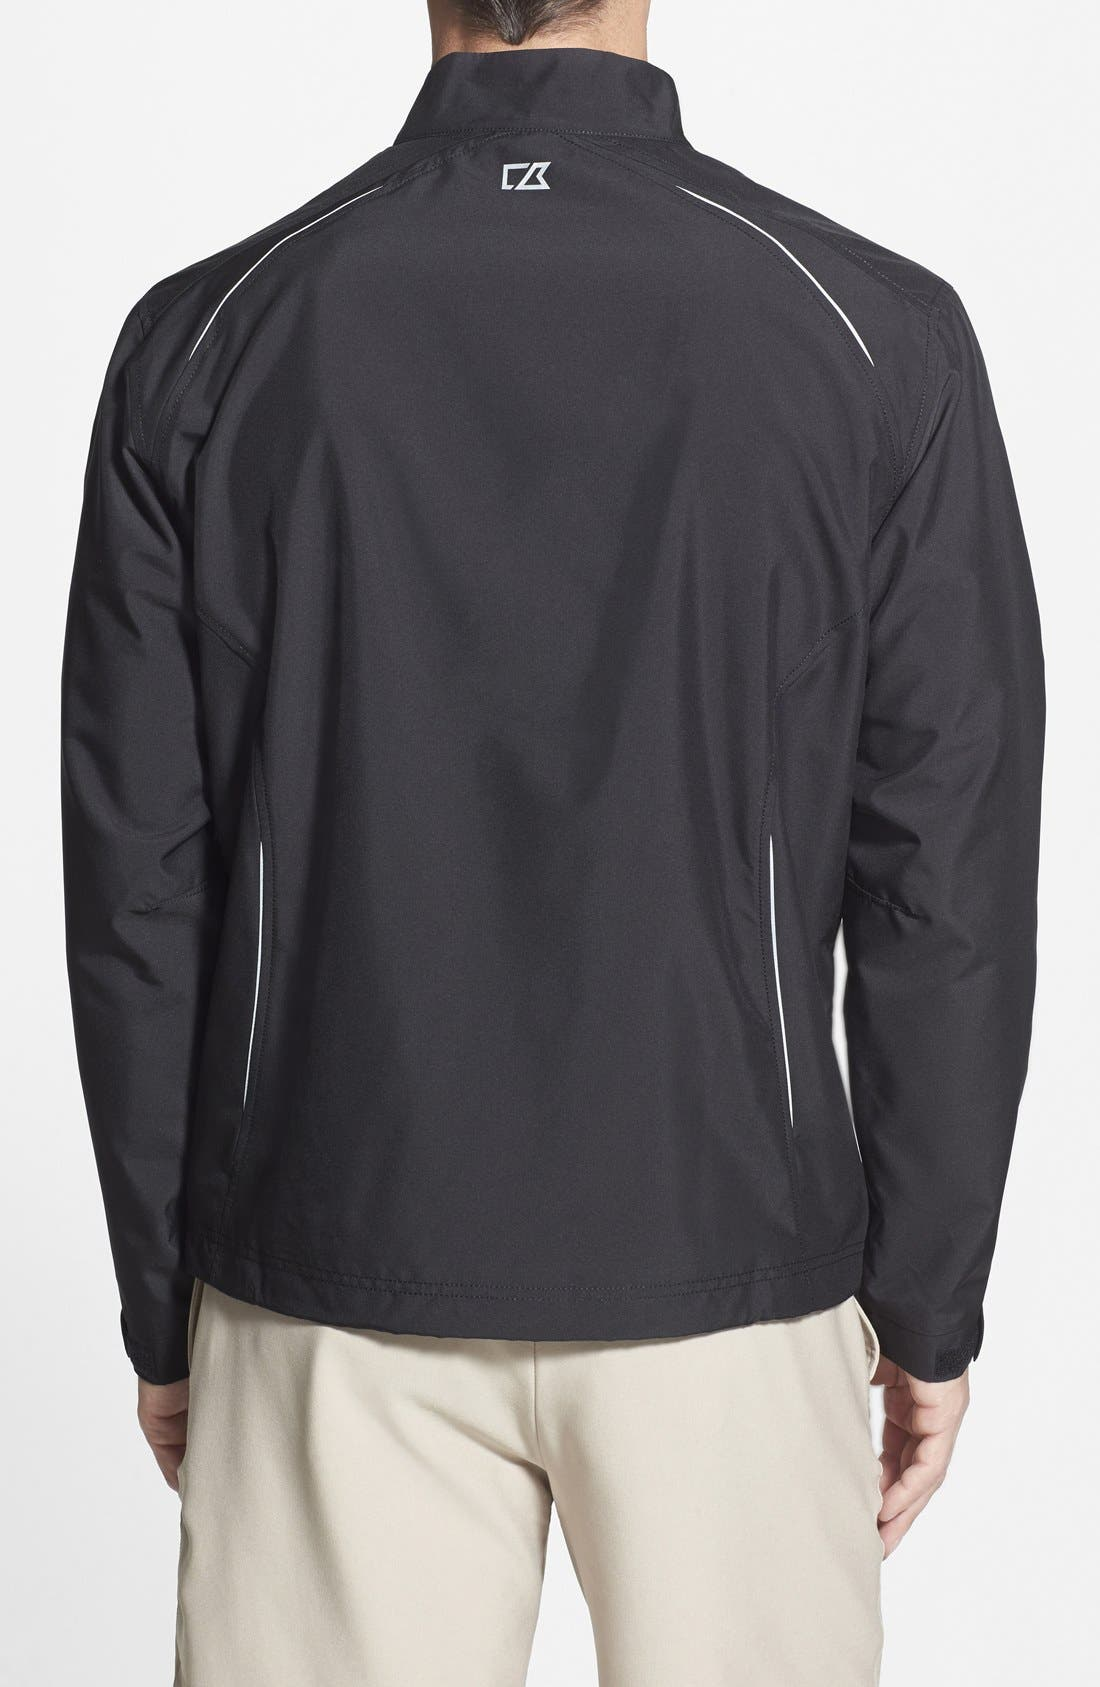 New Orleans Saints - Beacon WeatherTec Wind & Water Resistant Jacket,                             Alternate thumbnail 2, color,                             001